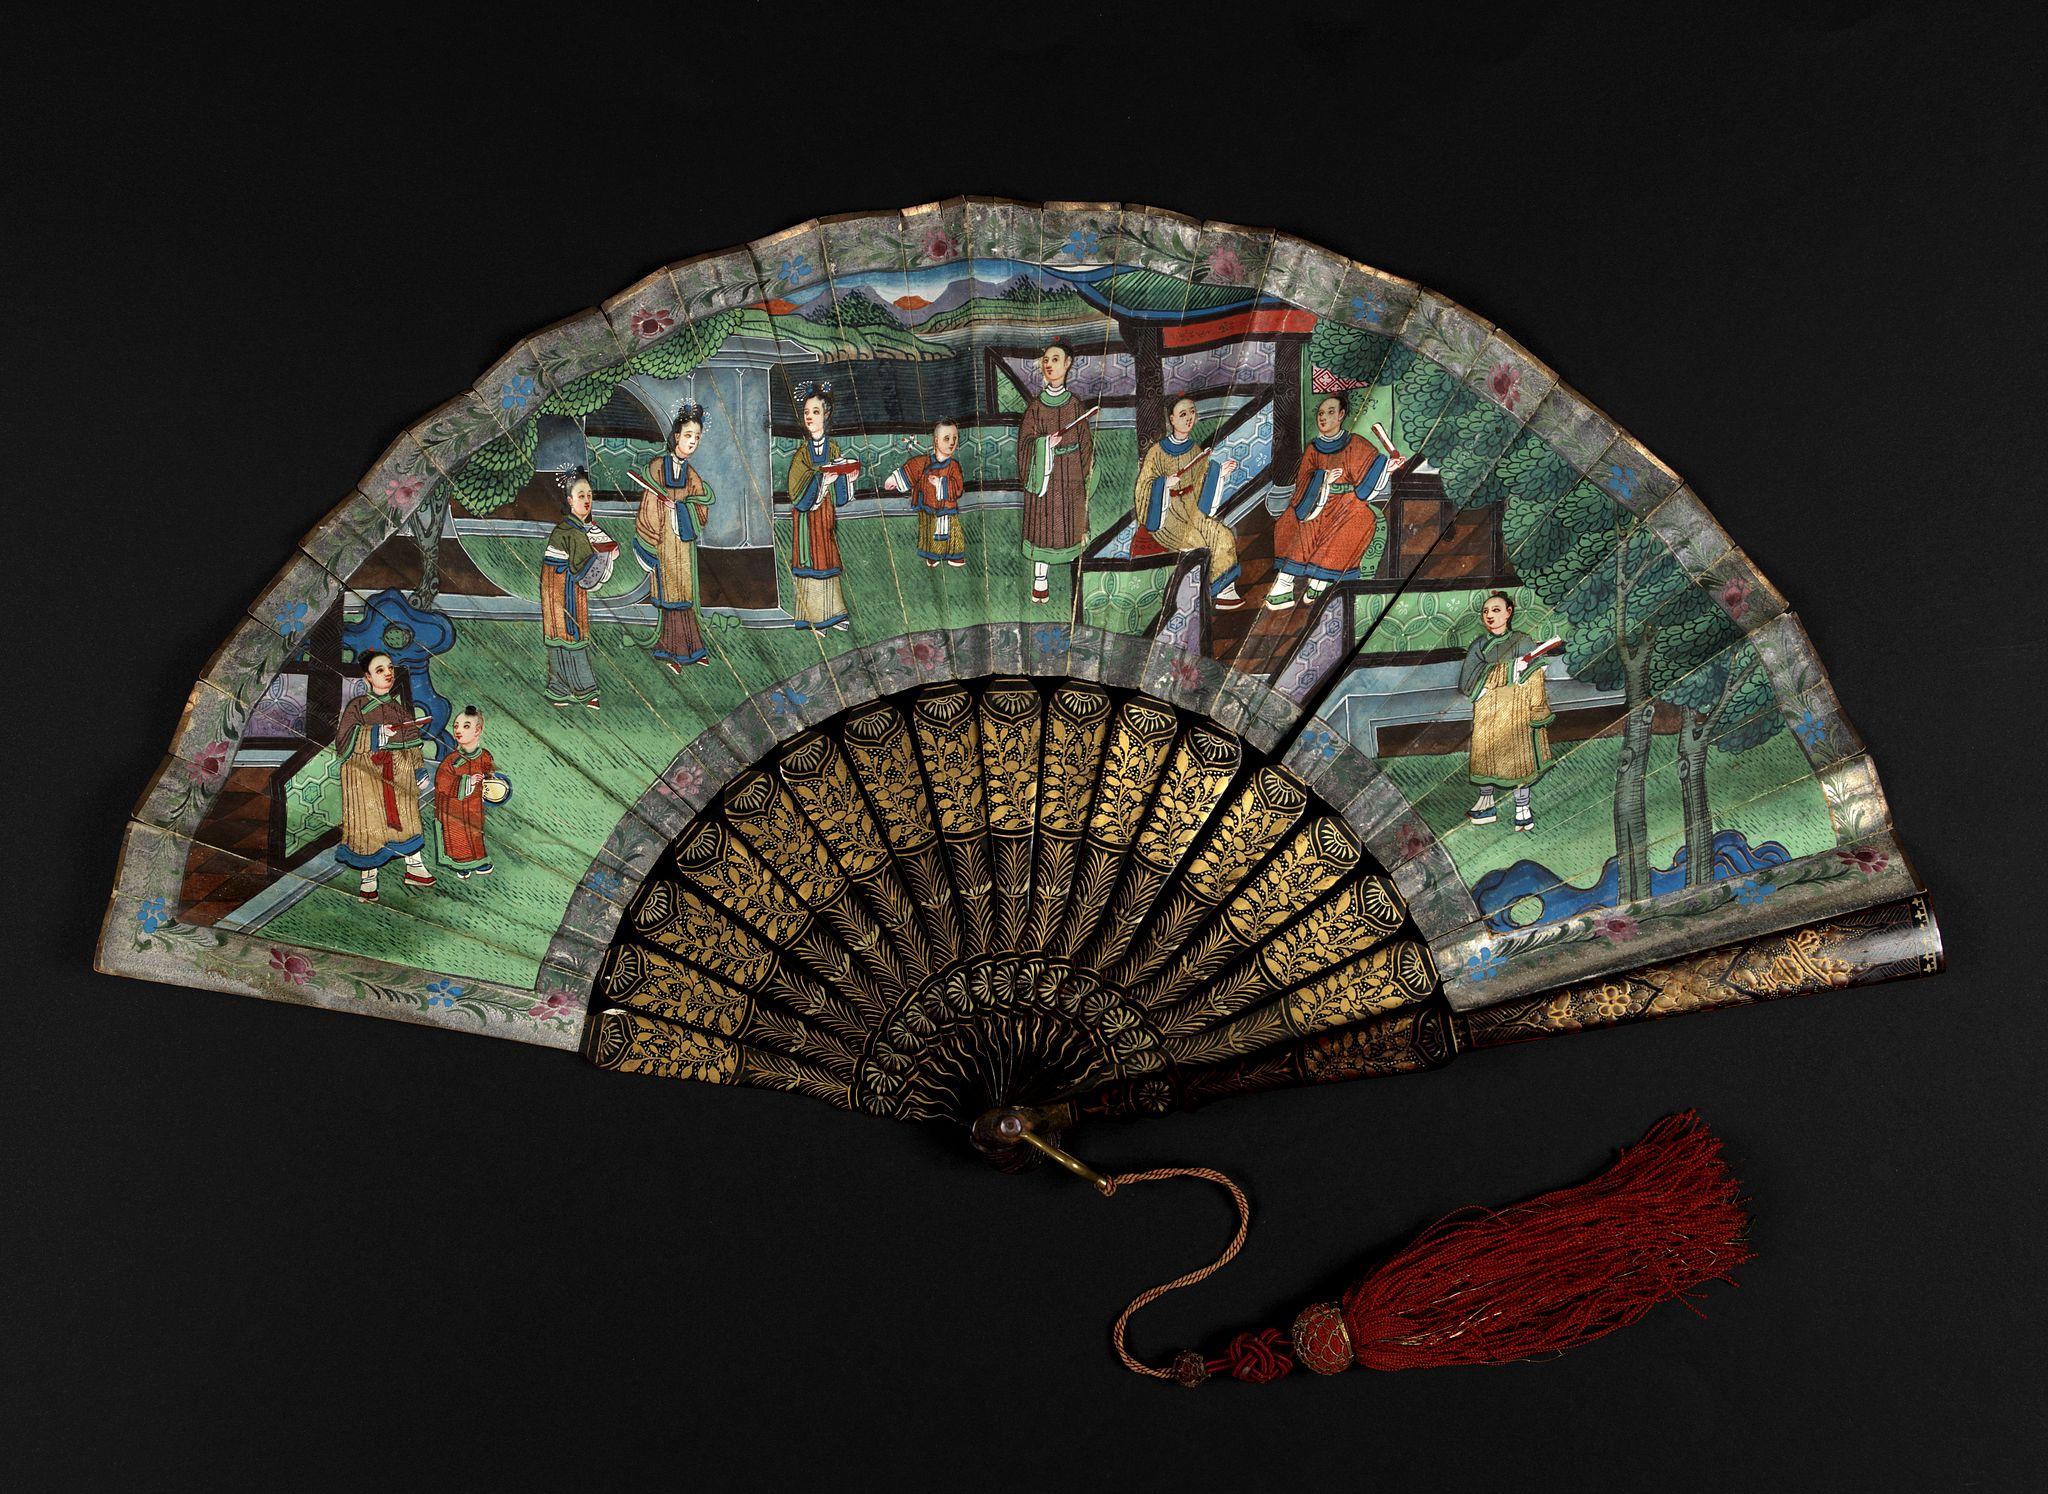 ANONYMOUS -  A Chinese Mandarin fan of a Palace garden scene.